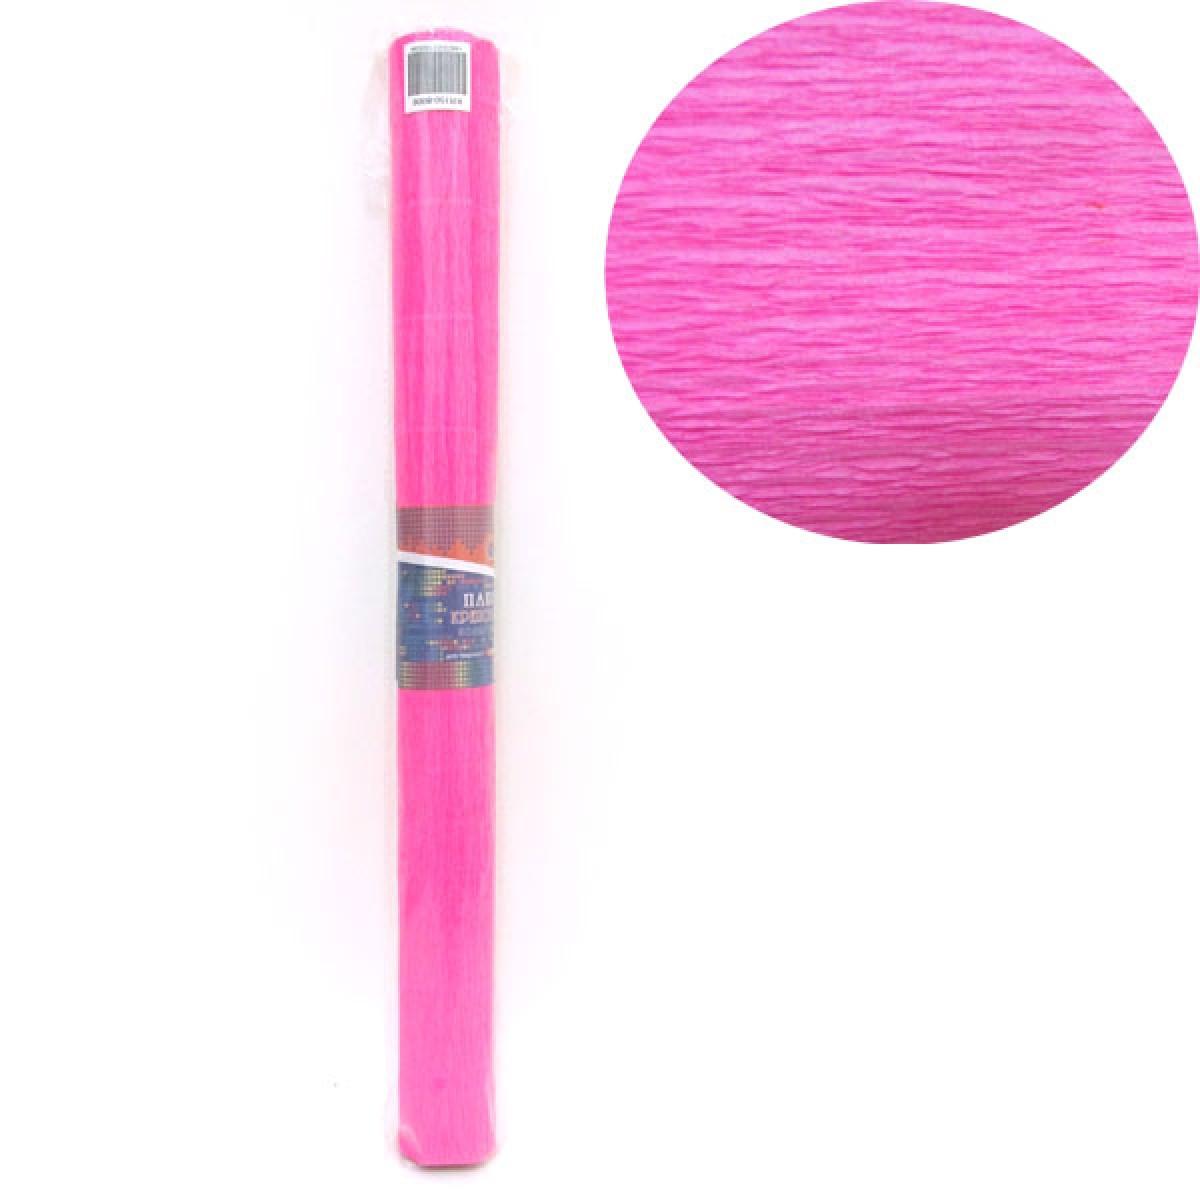 Креп-бумага 150%, ярко-розовый 50*200см, 1pc/OPP, осн.95г/м2, общ.238г/м2